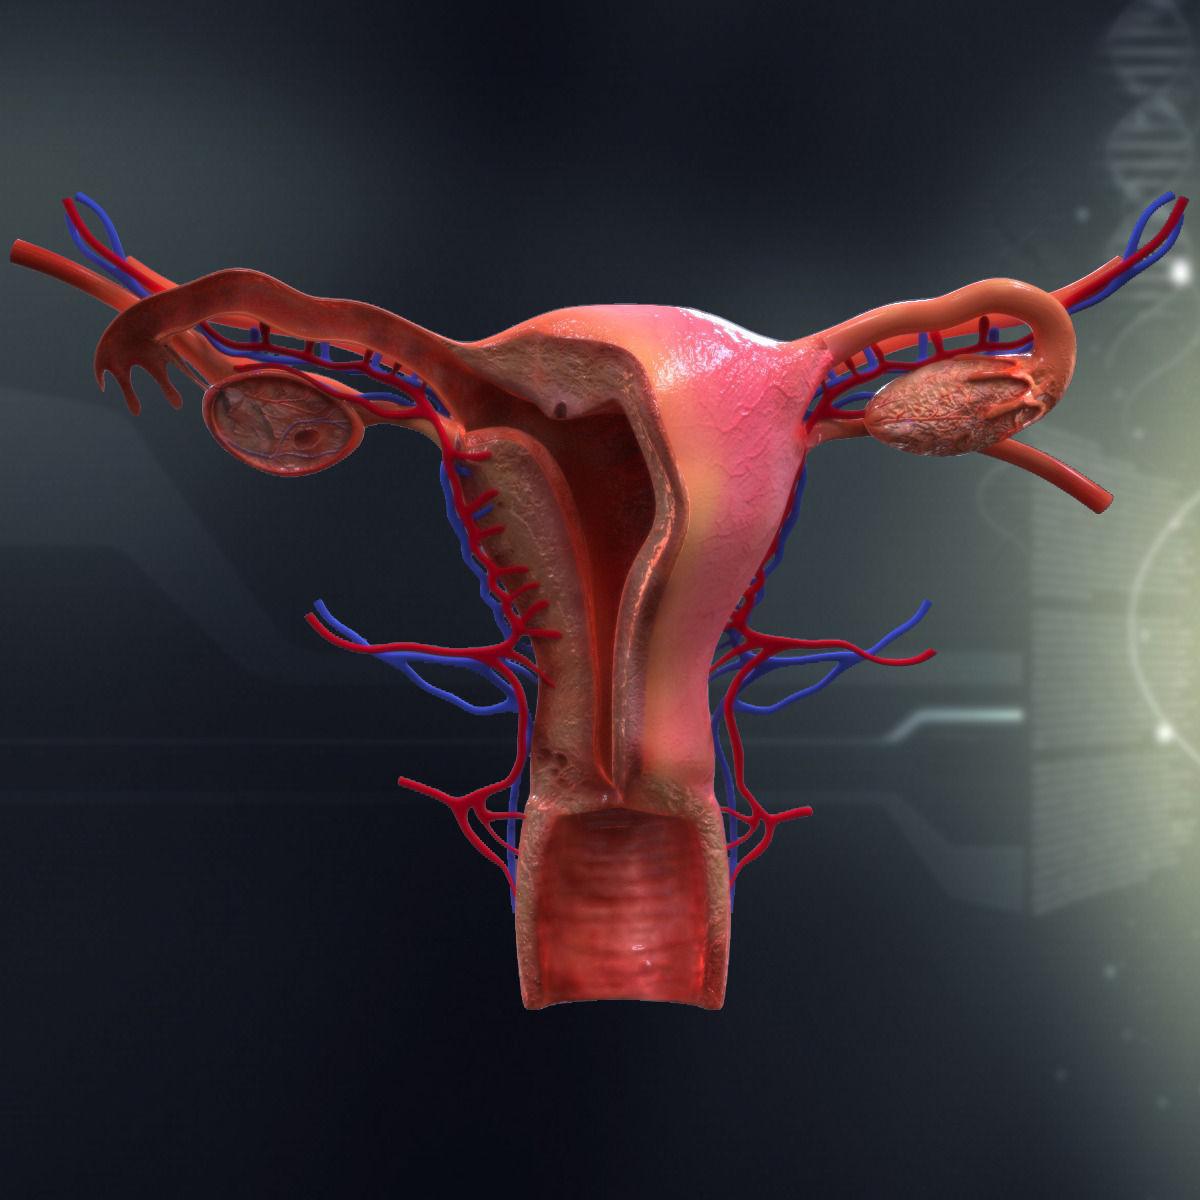 Human Female Organ Anatomy 3D model | CGTrader